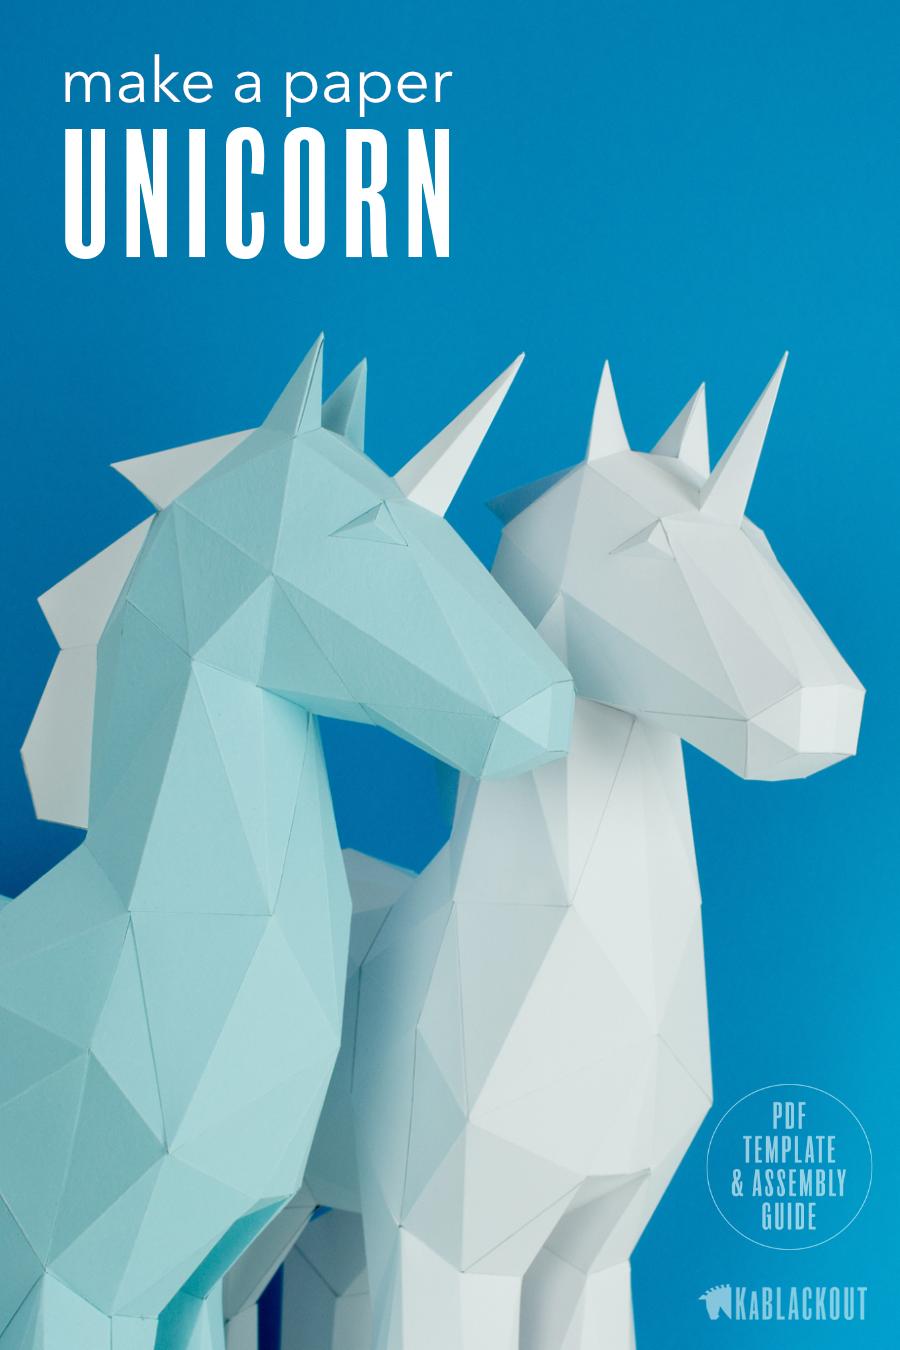 Papercraft Unicorn Template, DIY Unicorn Papercraft, Low Poly ...